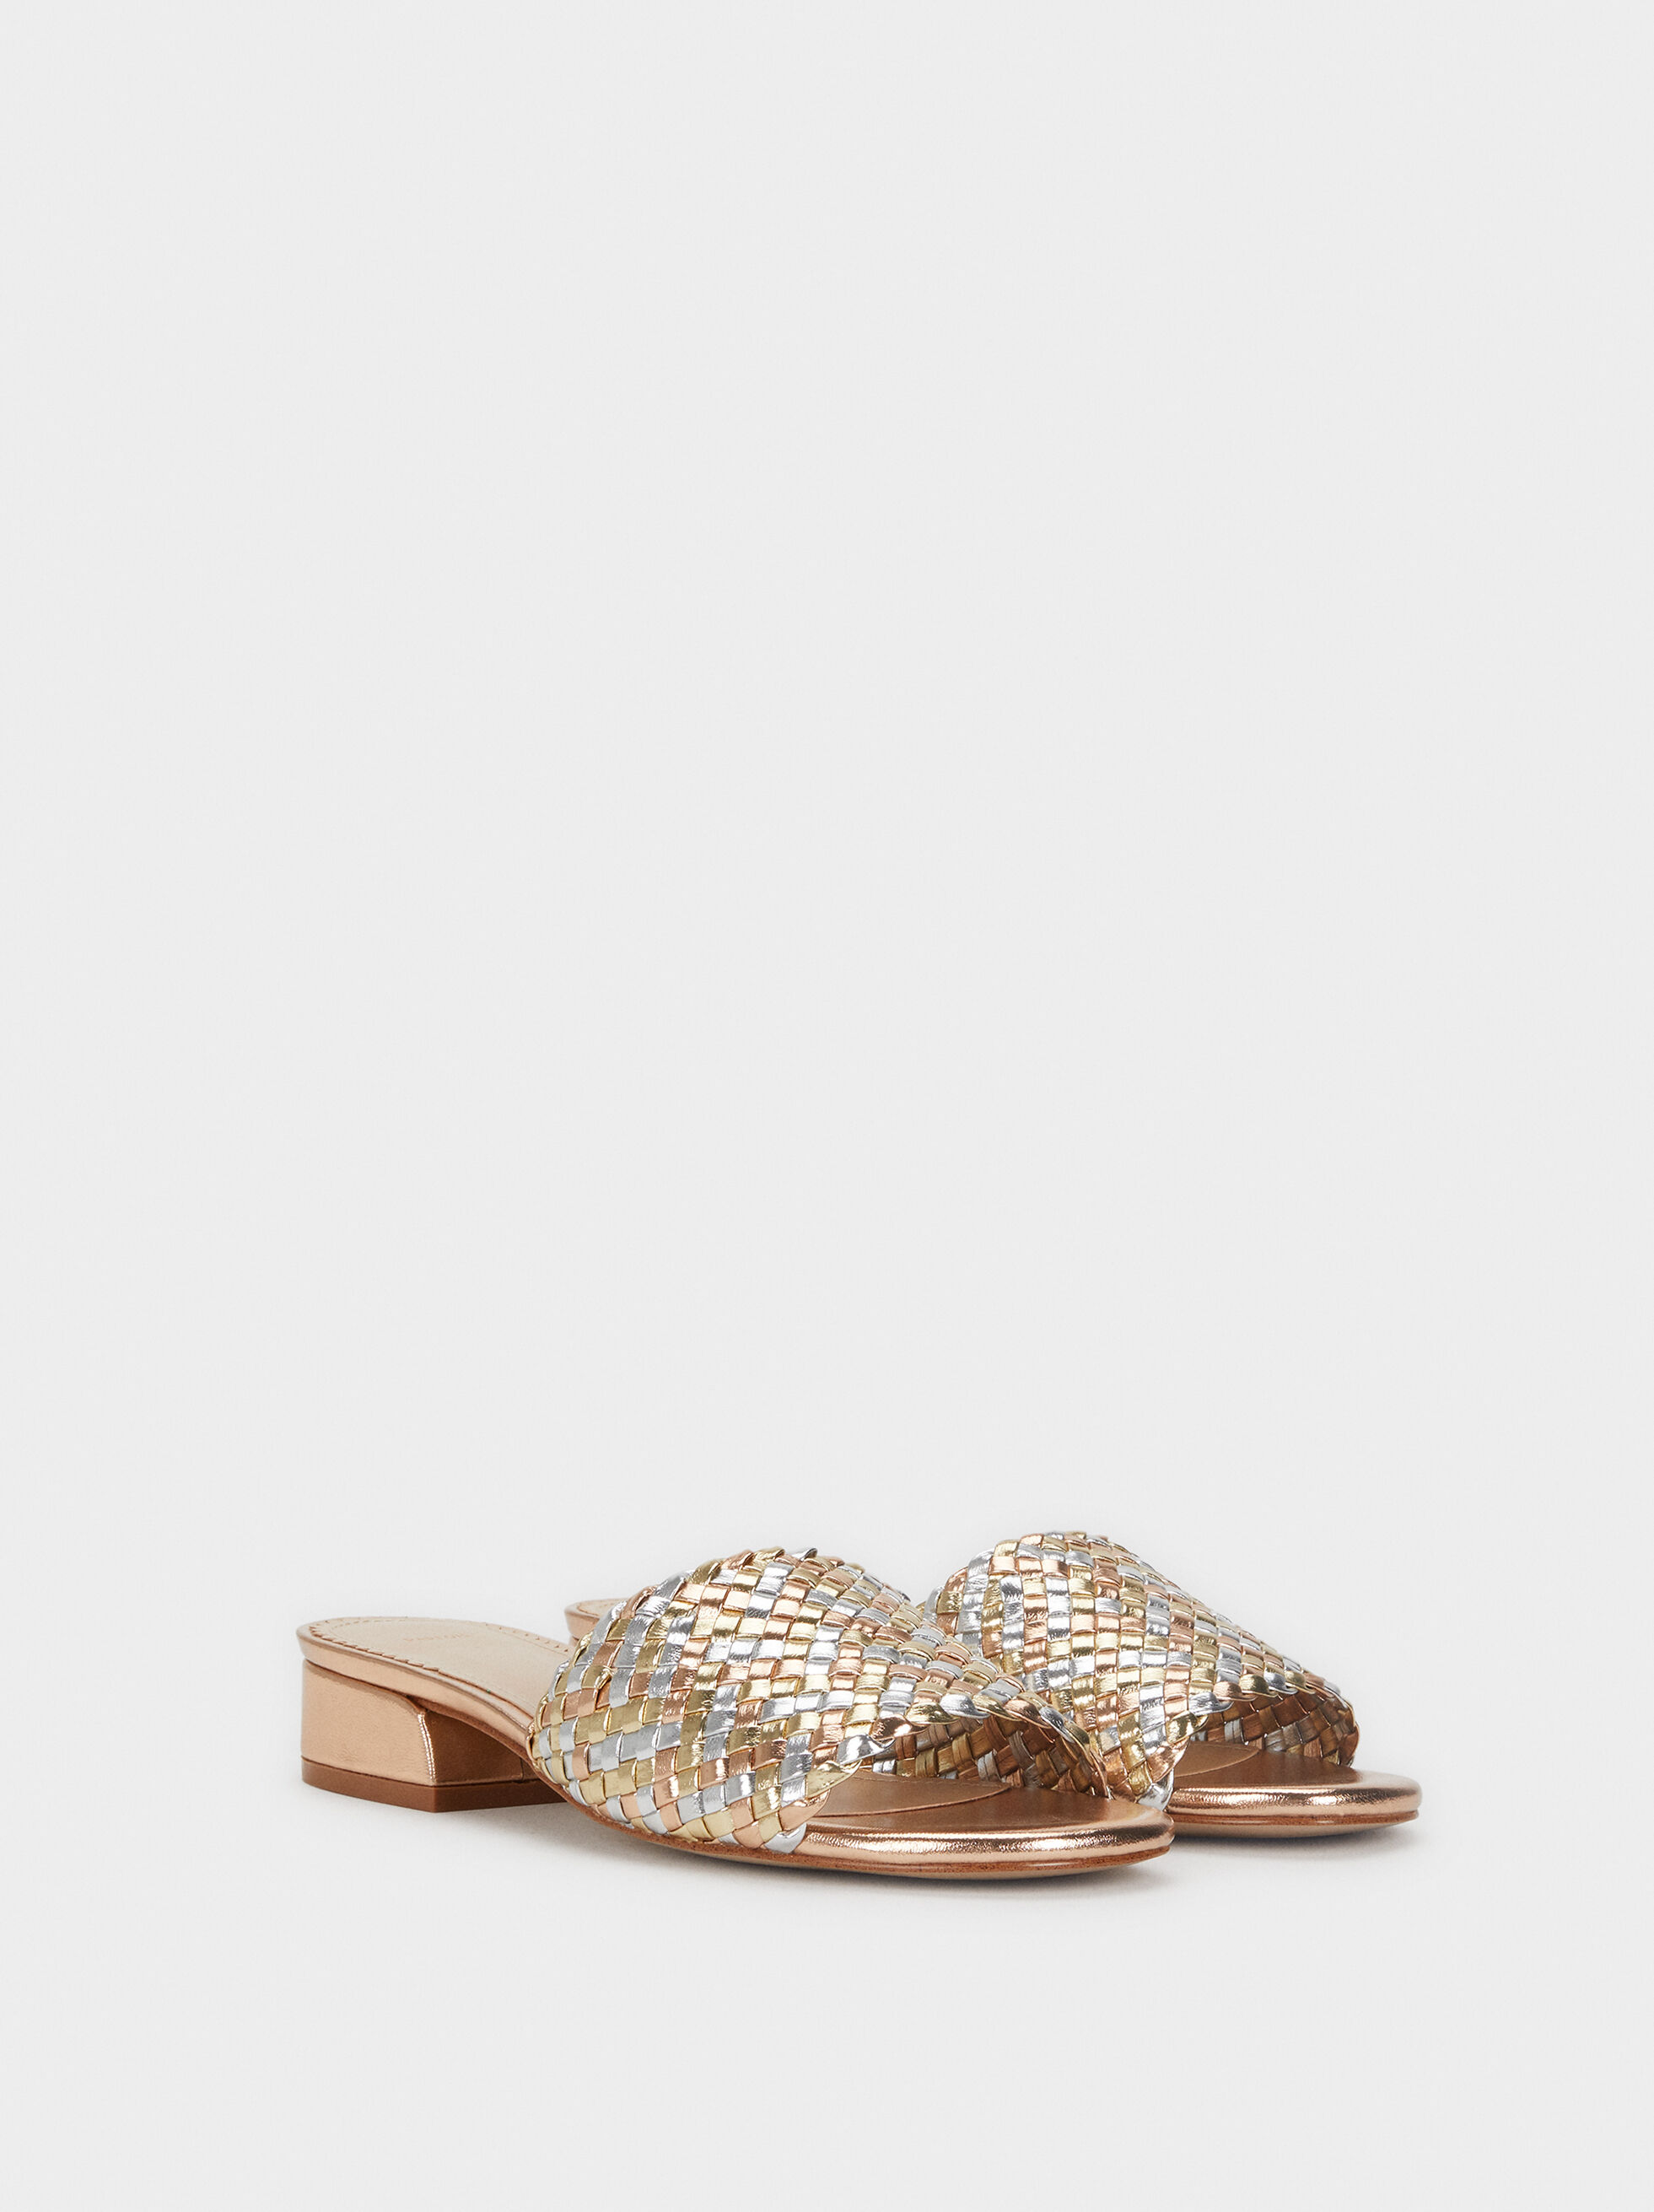 Flat Braided Sandals, Multicolor, hi-res